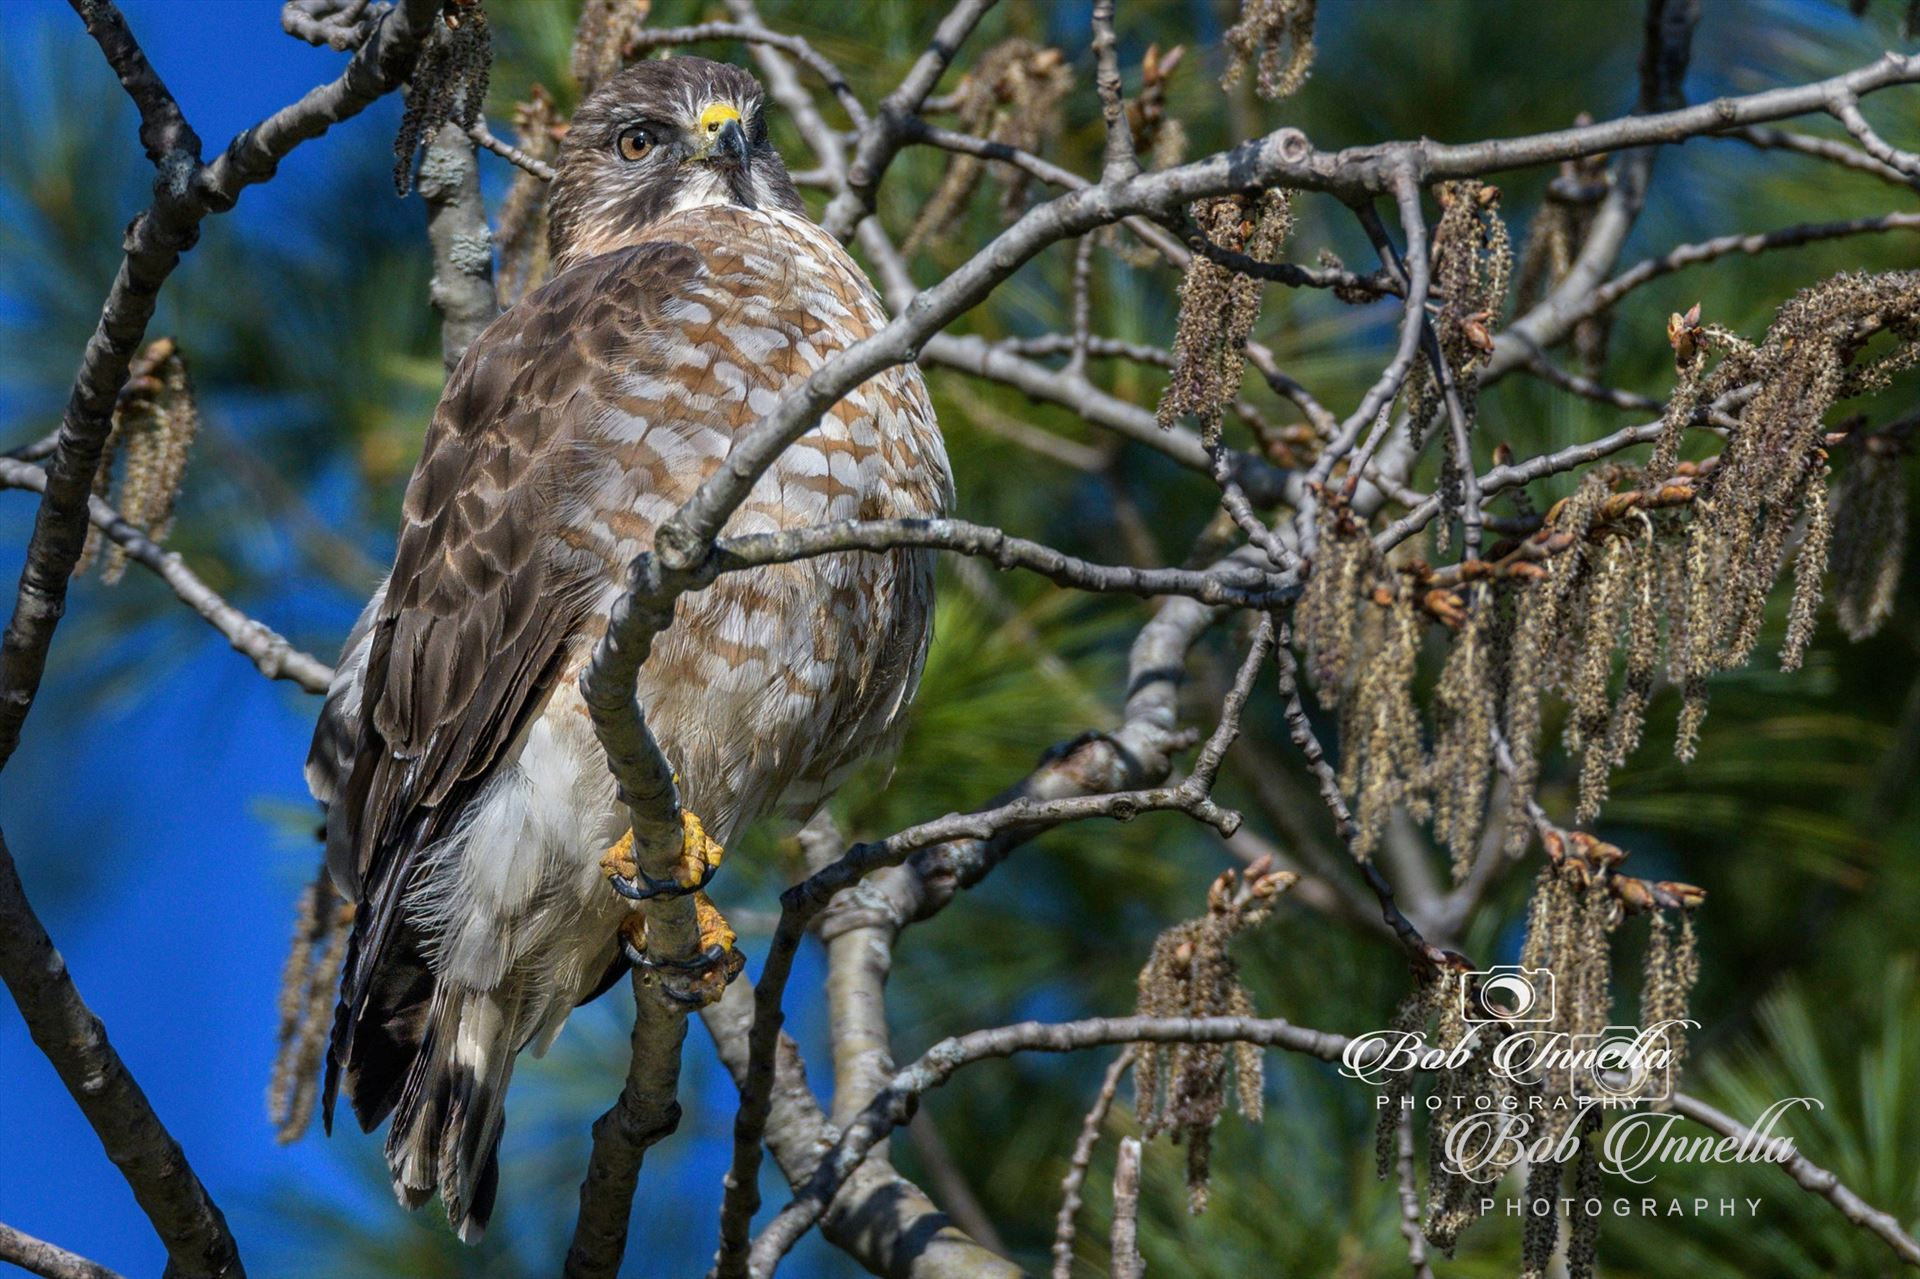 Hawk Taken In The Wilds Of Pennsylvania by Buckmaster